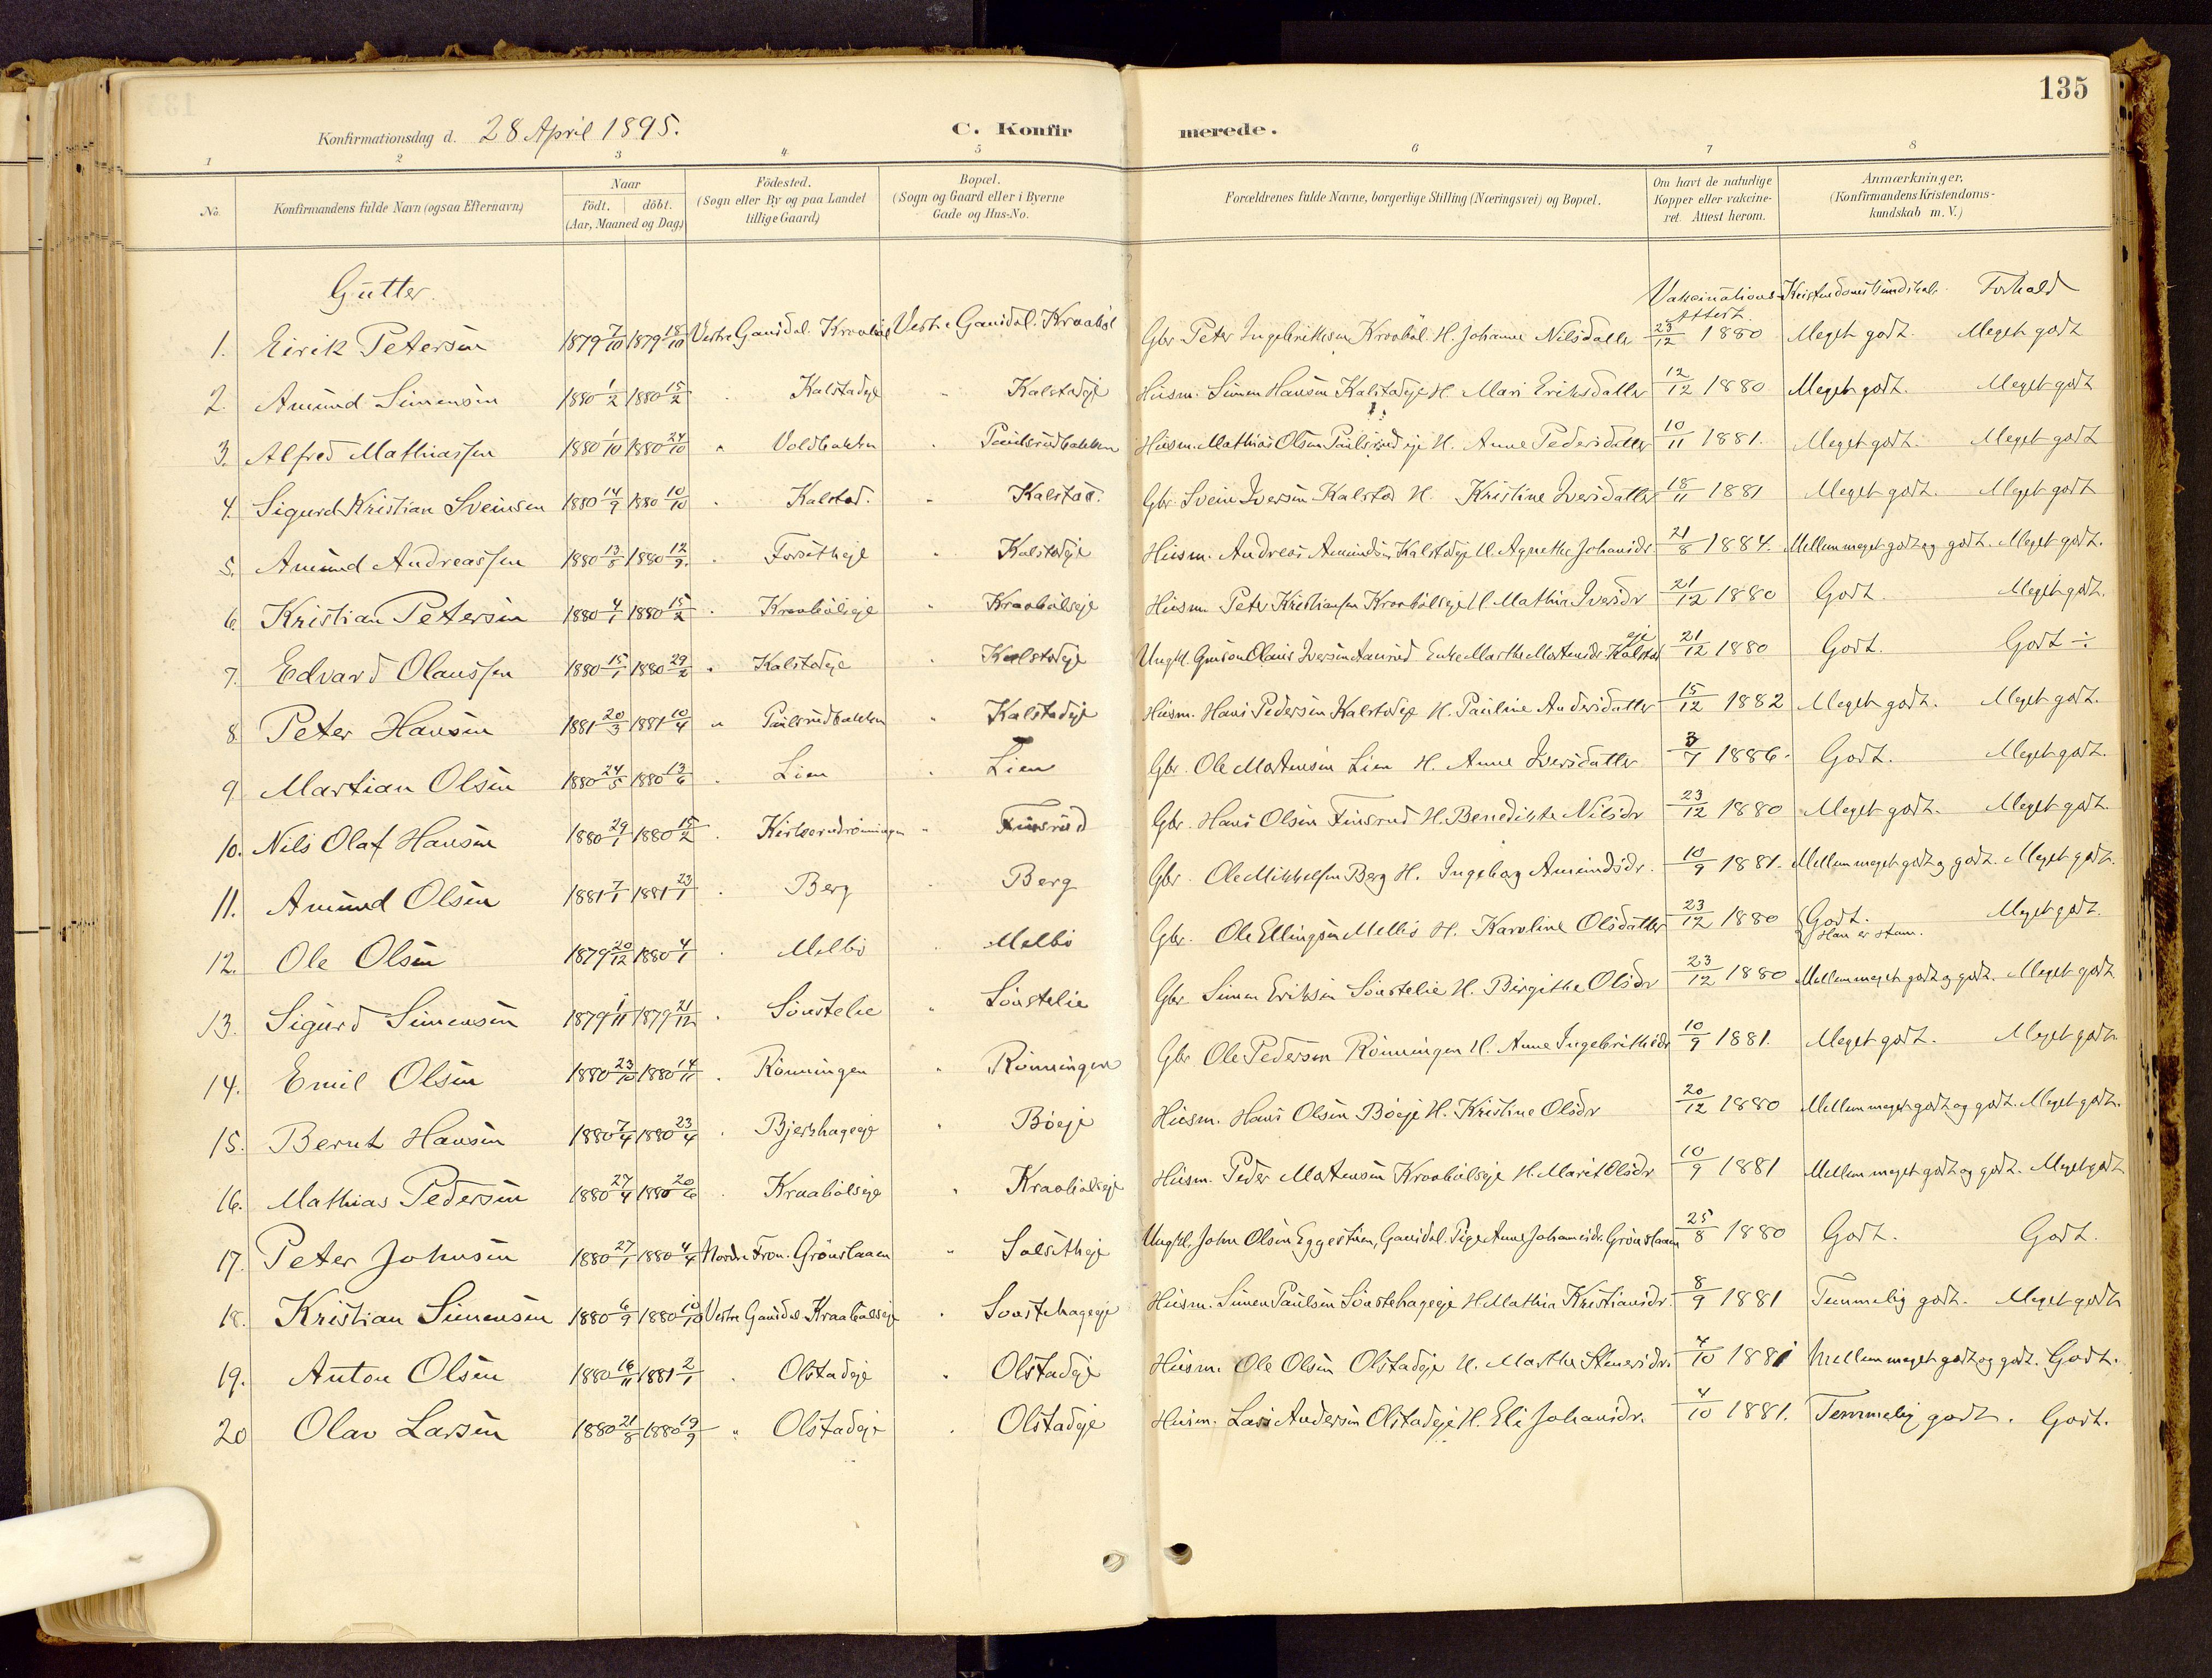 SAH, Vestre Gausdal prestekontor, Ministerialbok nr. 1, 1887-1914, s. 135